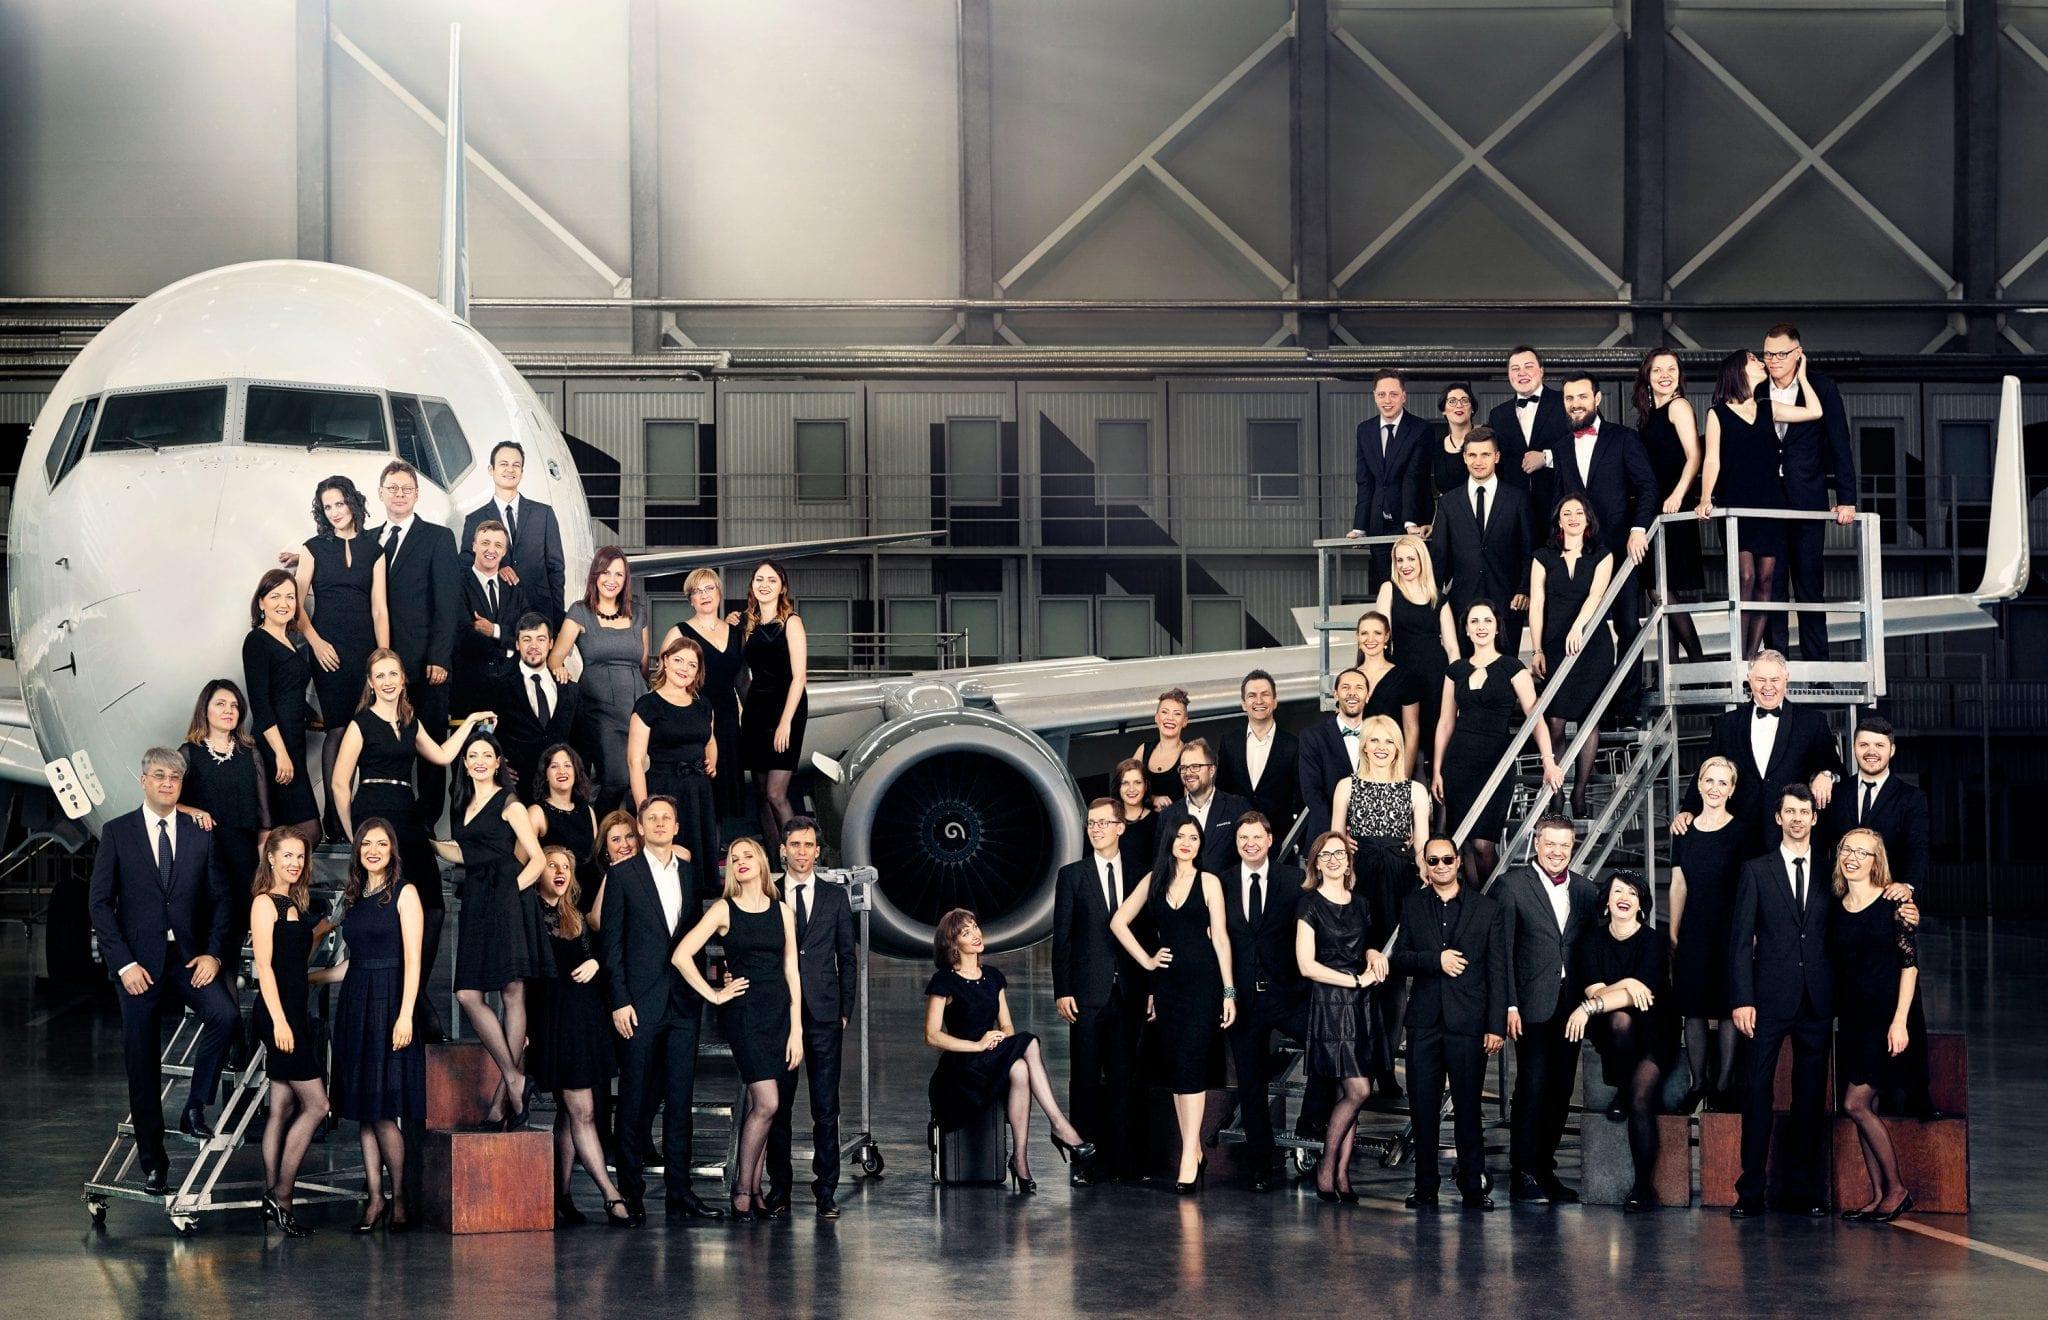 Bel-Canto-Choir-Vilnius-2016-PhotoShoot-013